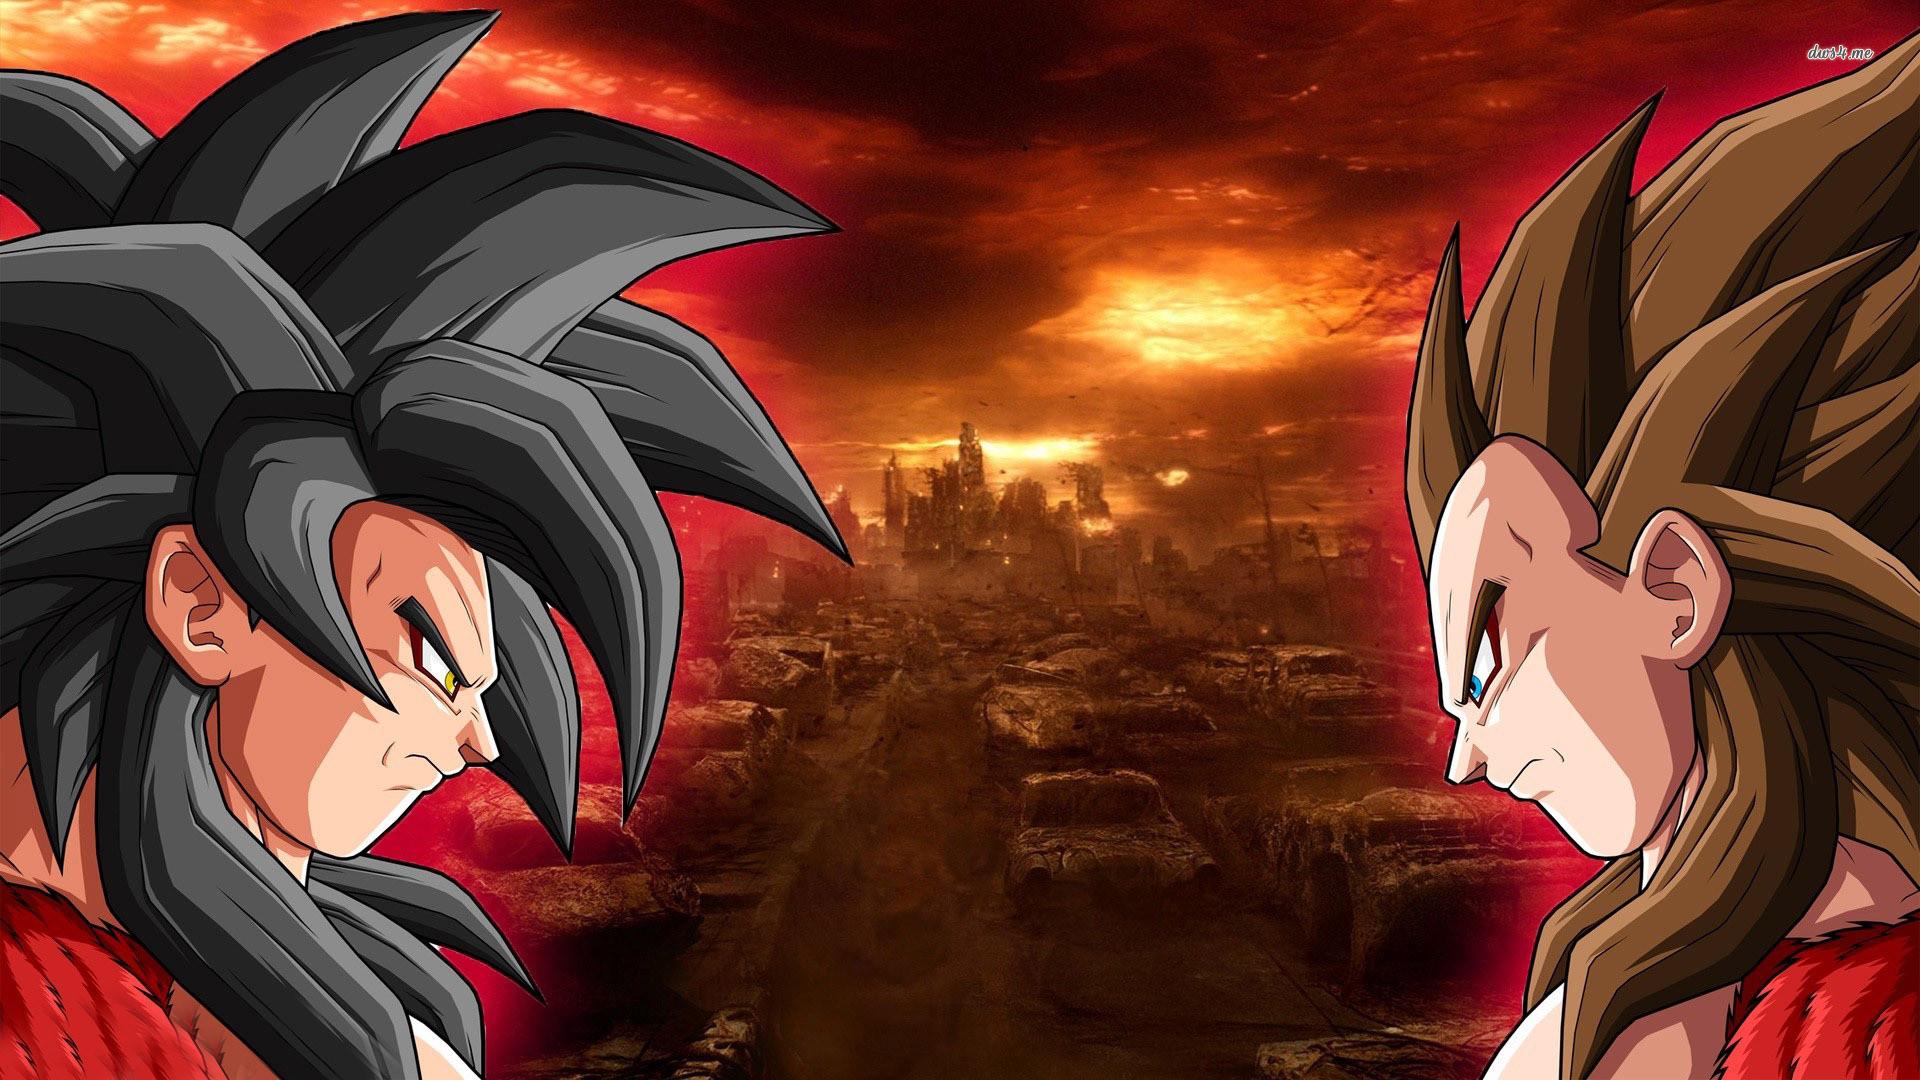 HD Quality Super Saiyan Goku Vs Vegeta Dragon Ball Z Wallpaper .